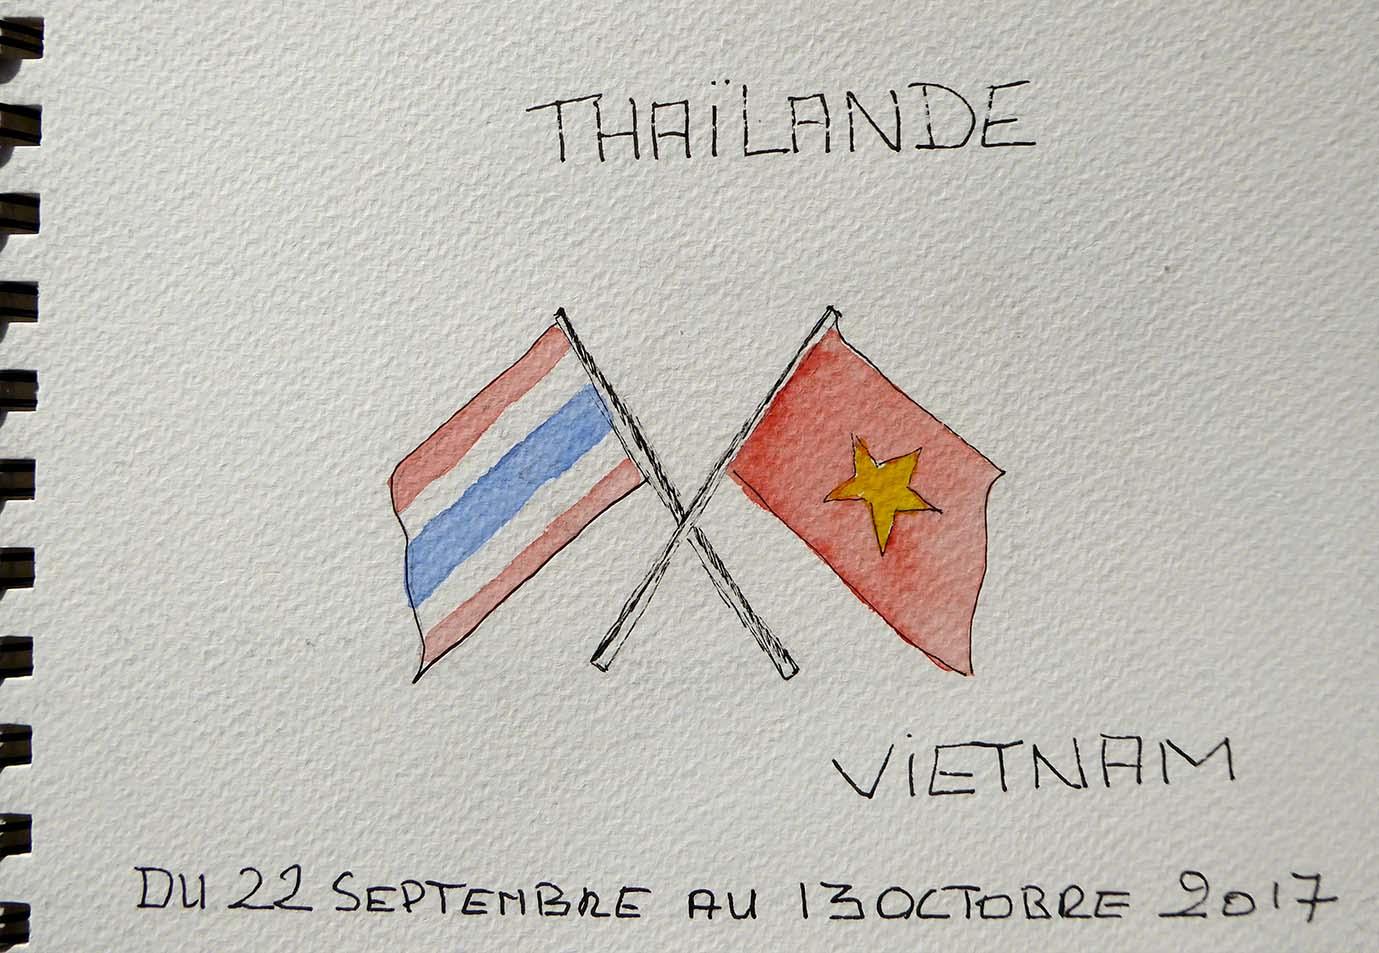 THAI BIS 2